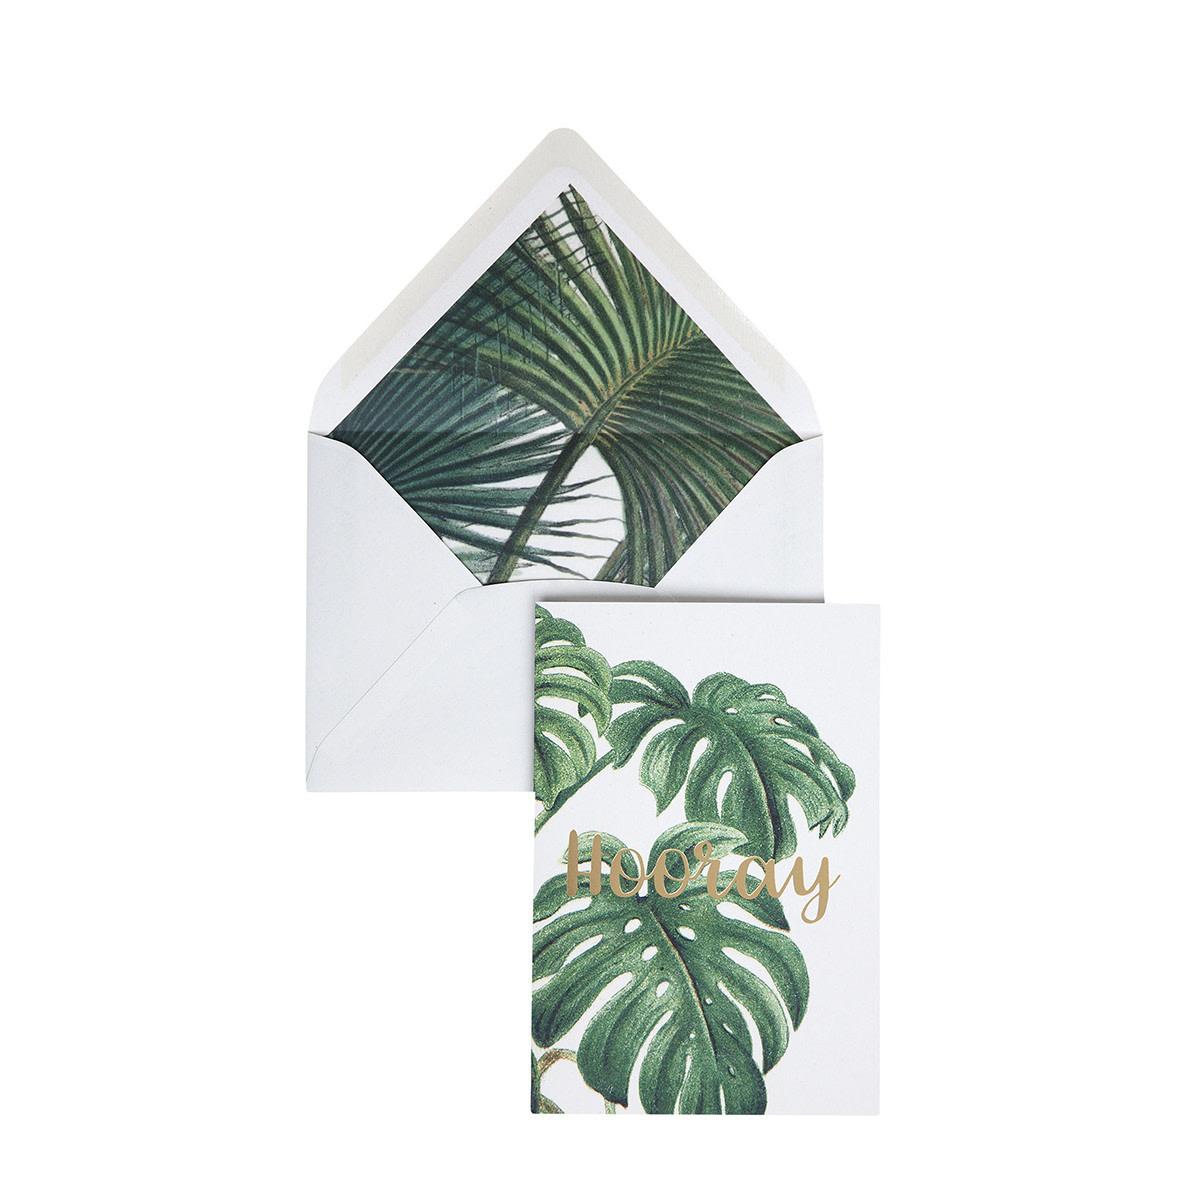 Wenskaart Botanic Palm - Hooray-1